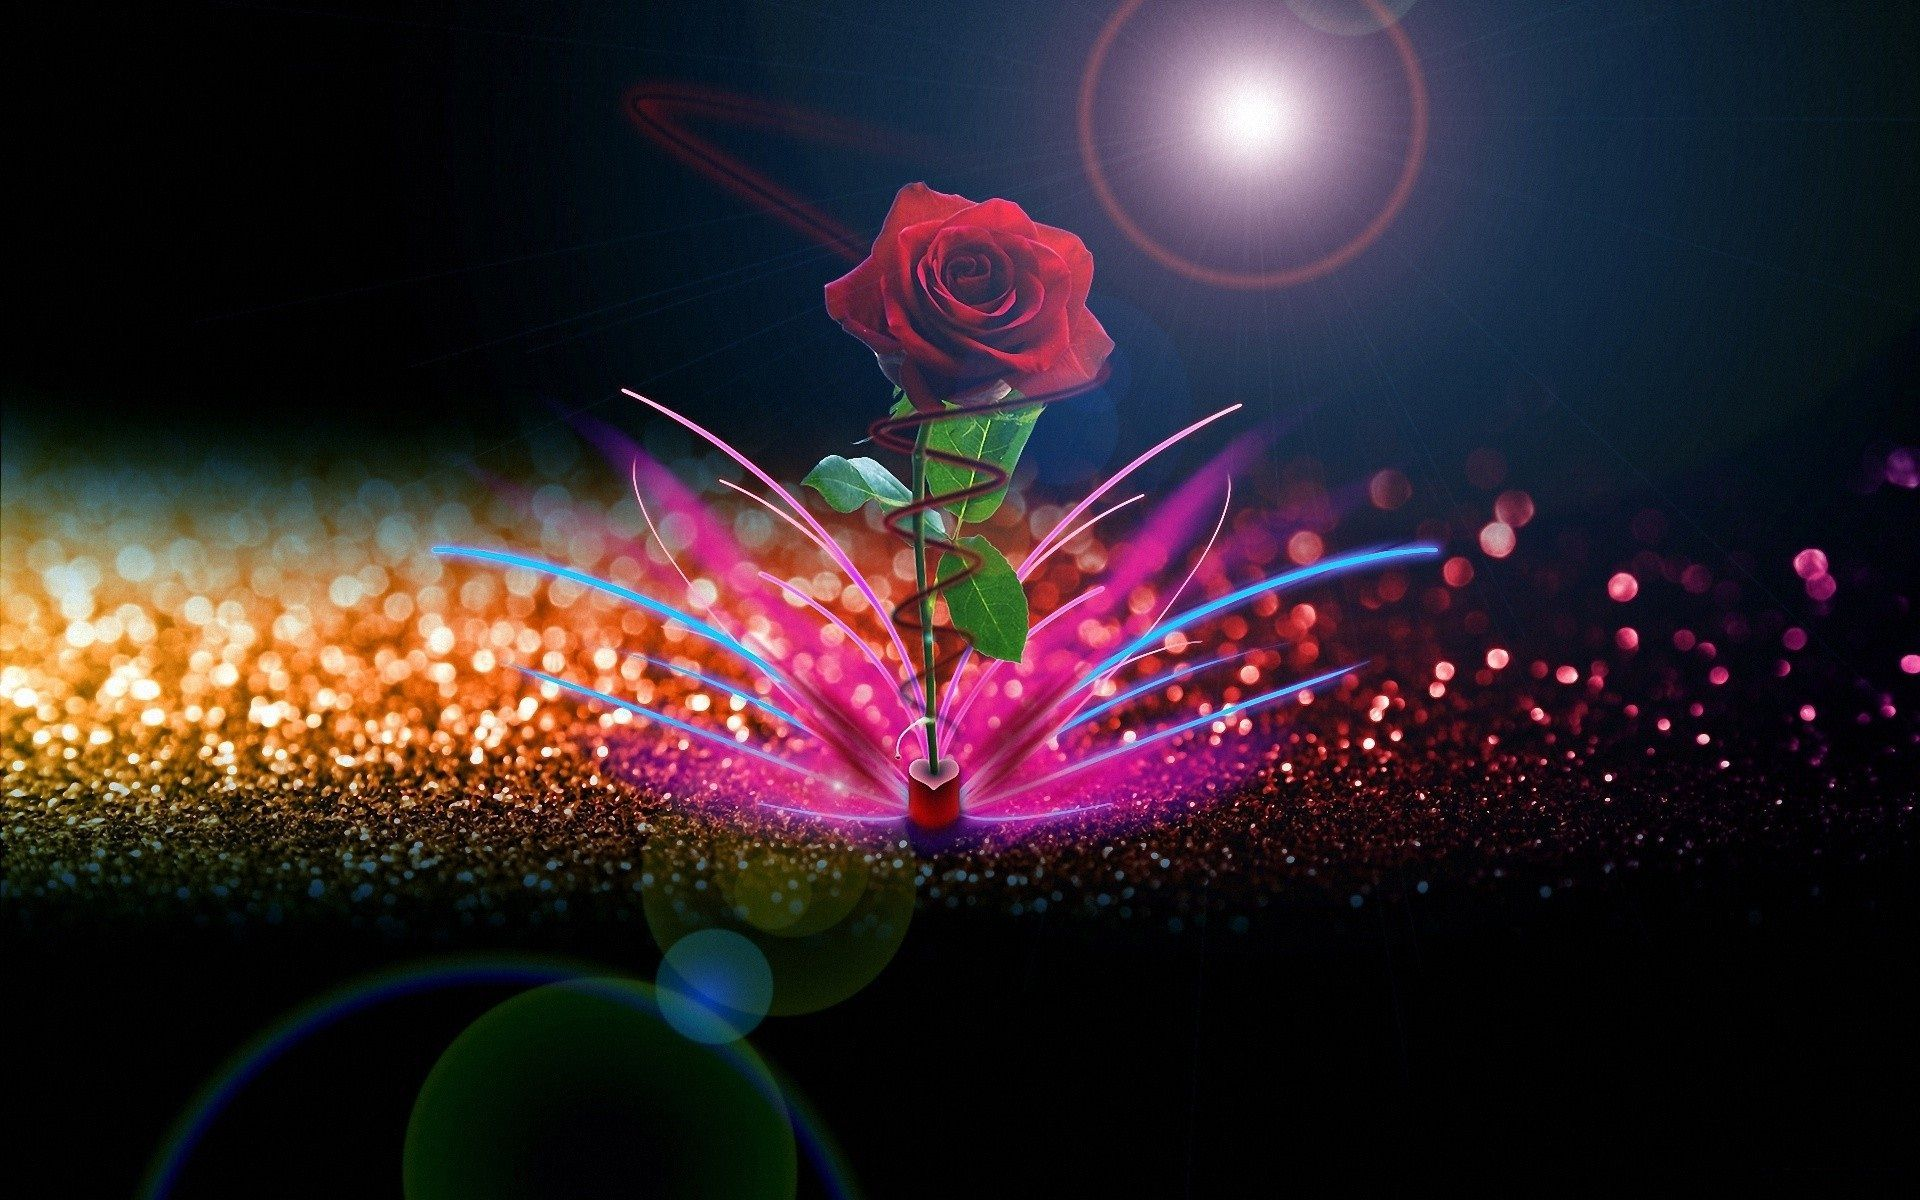 Rose Love Wallpaper Good Night Images Rose Flower Wallpaper